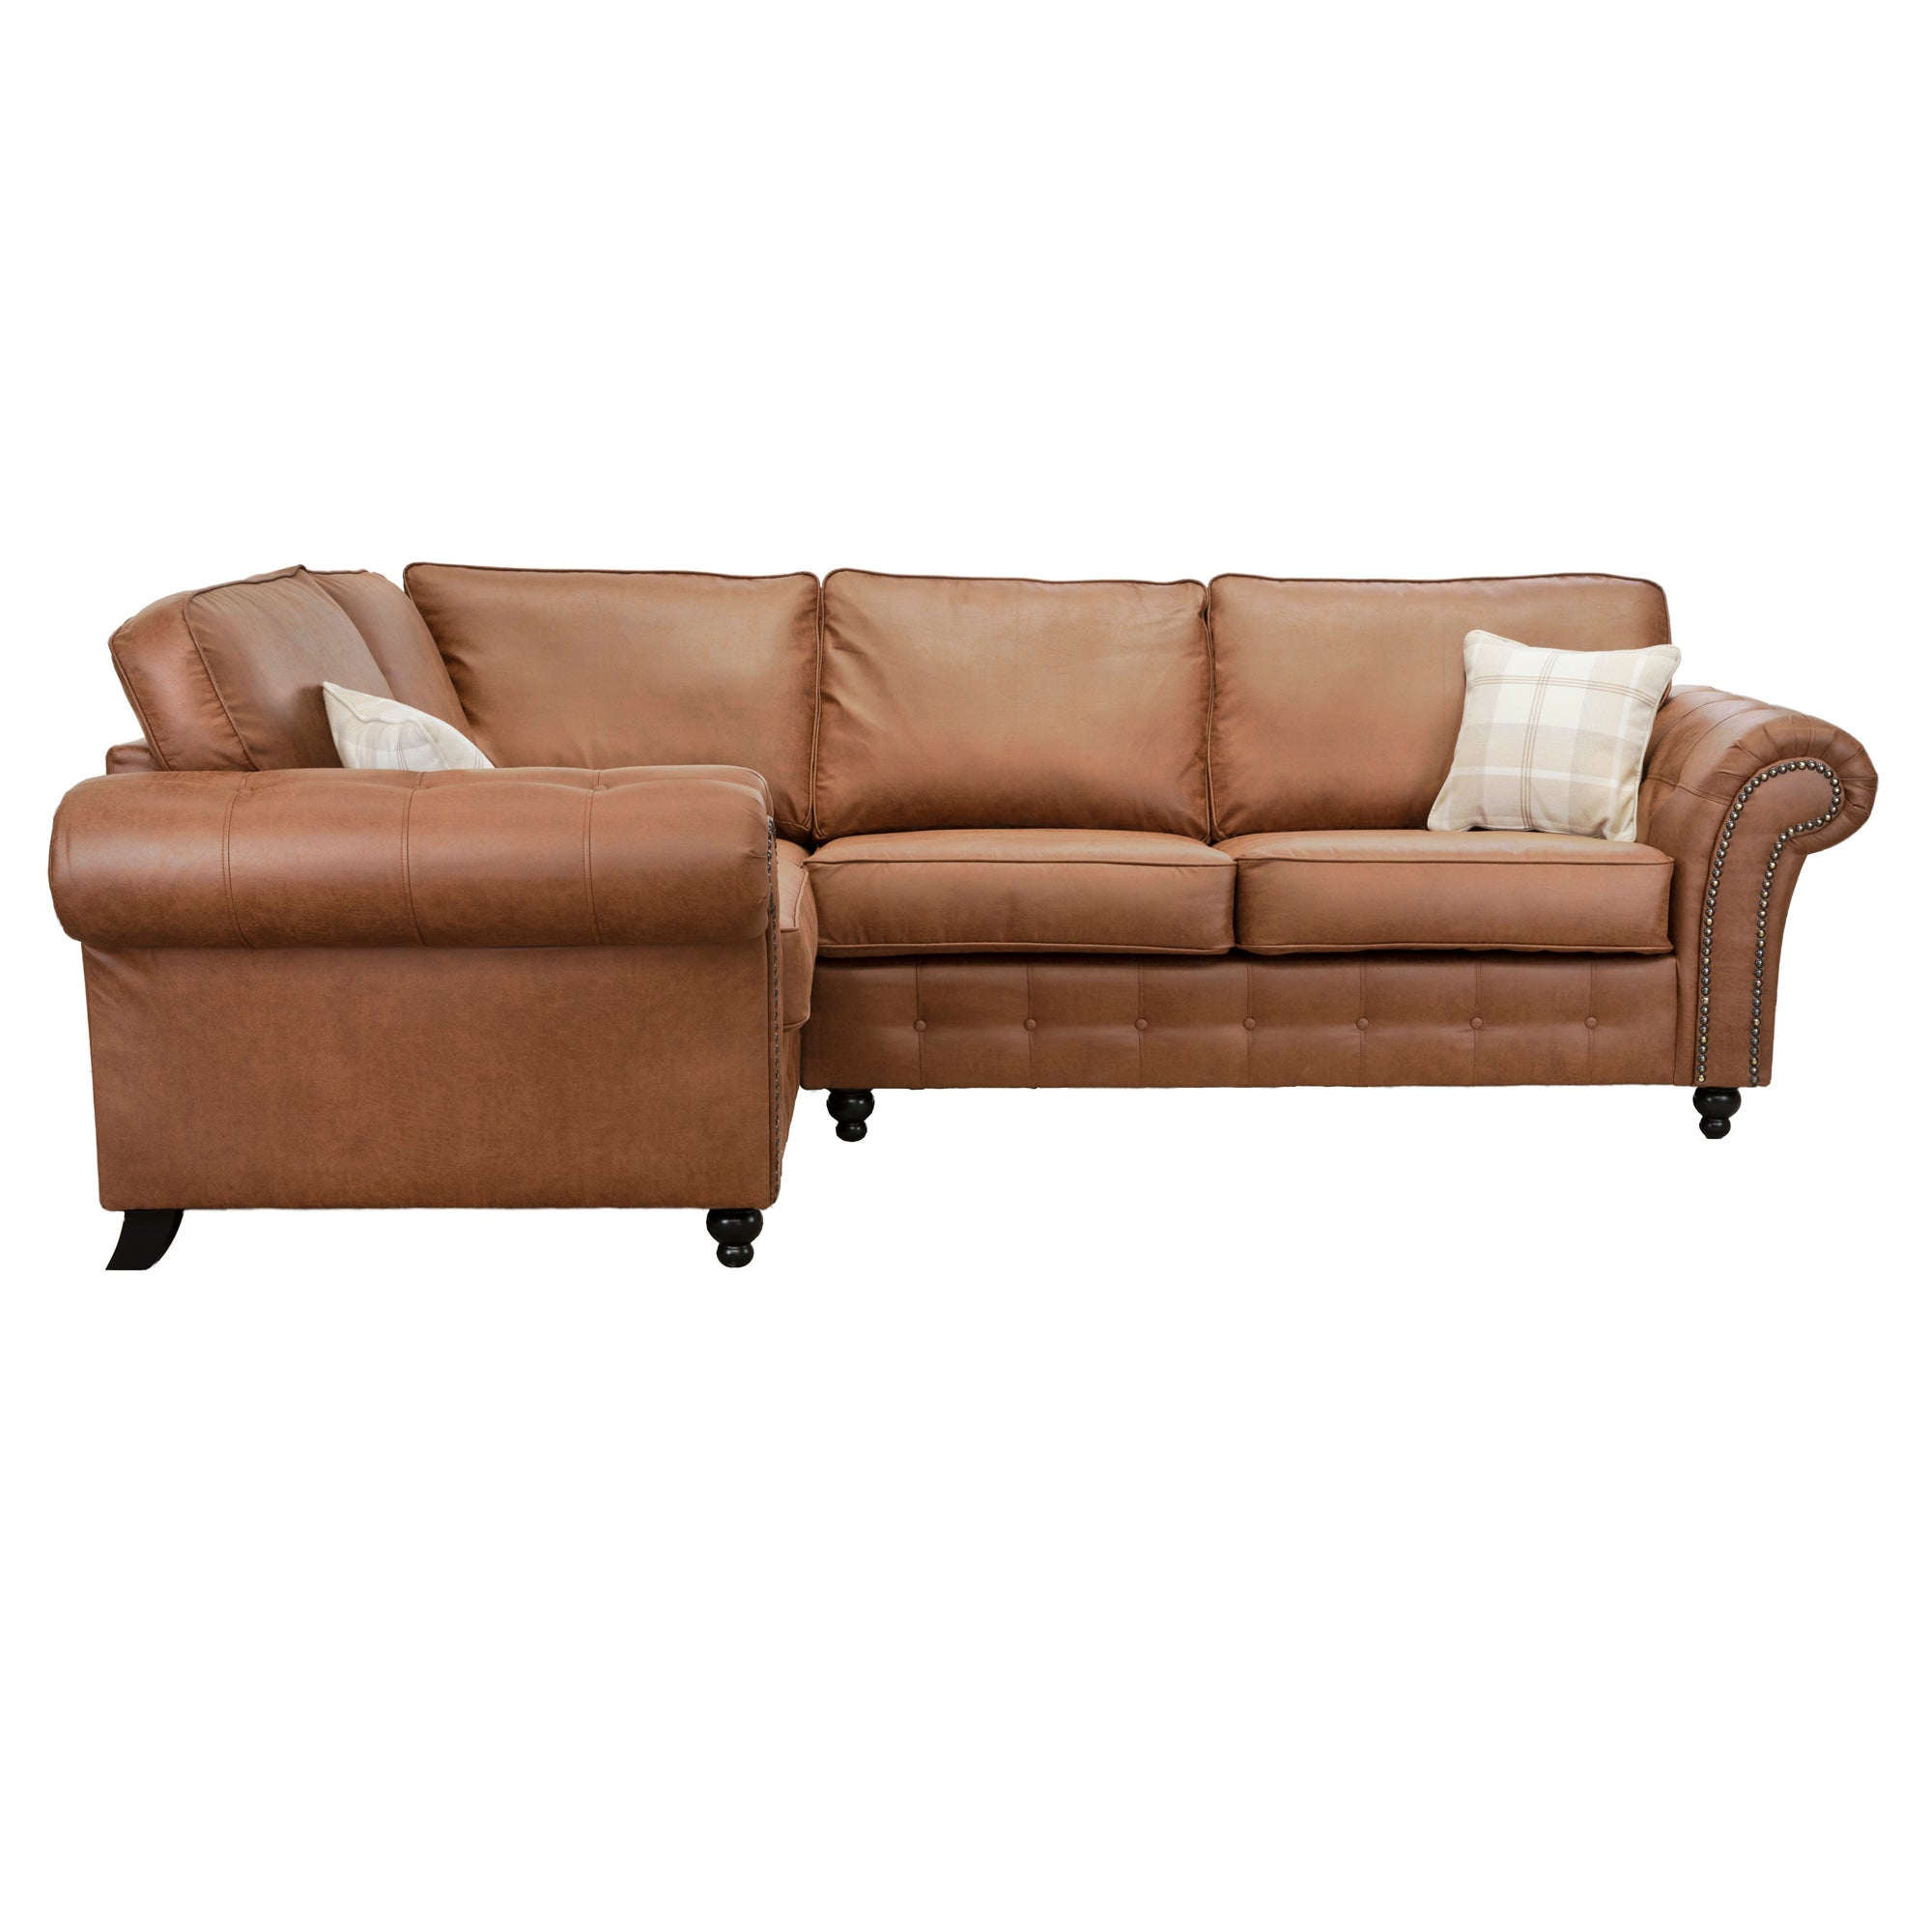 The Original Sofa Company Oakland Left Hand Faux Leather Corner Sofa Brown